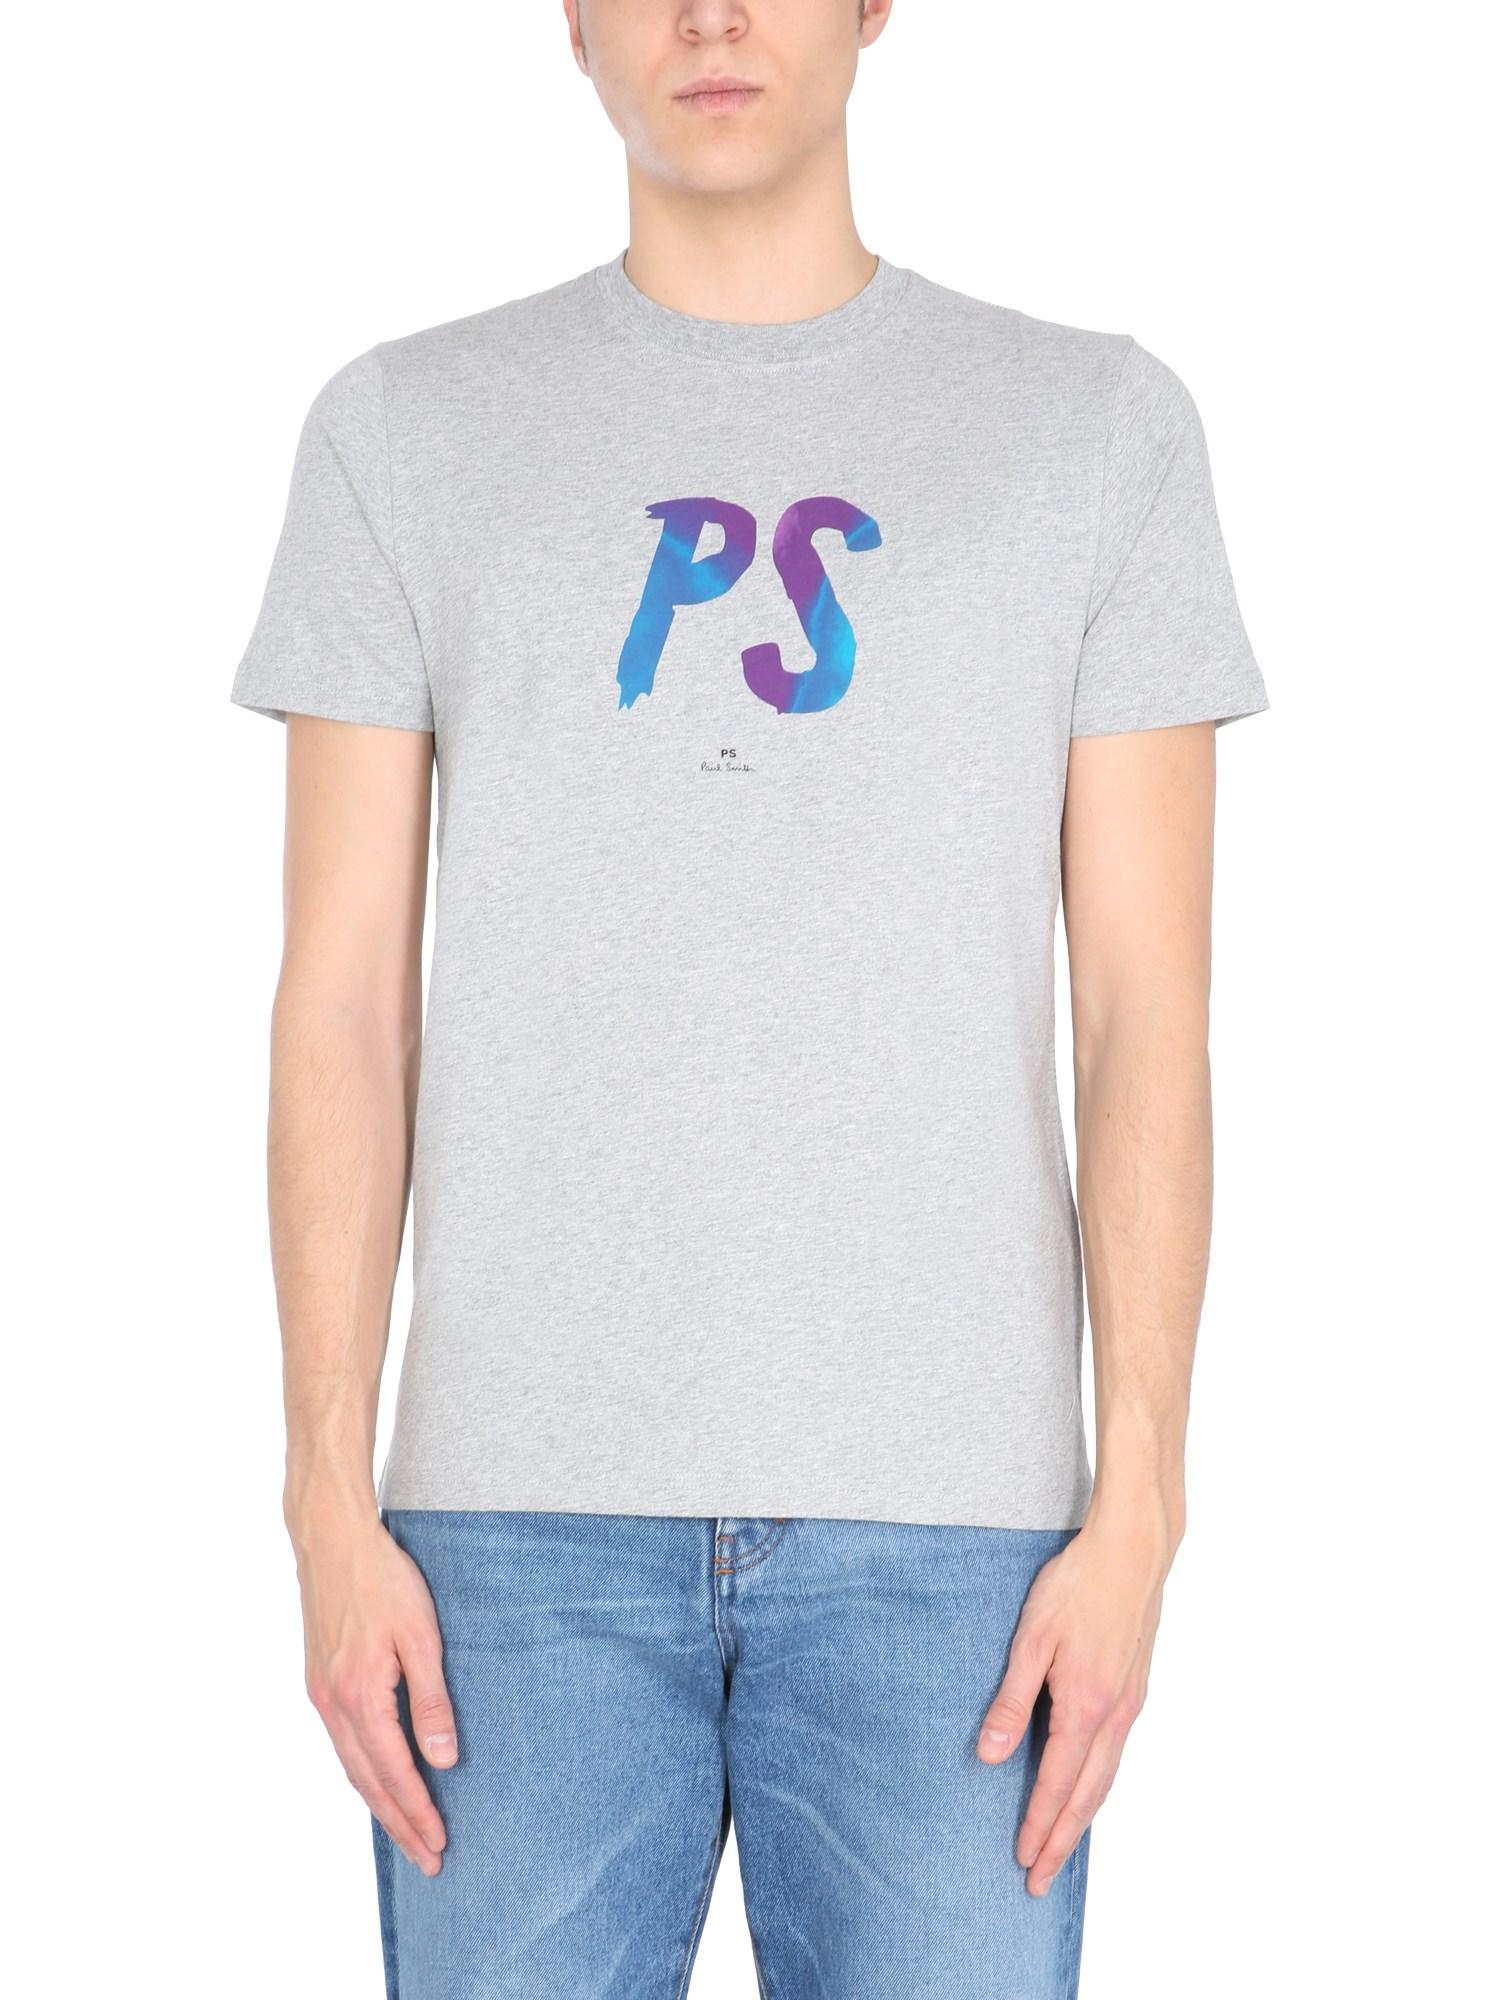 Ps by paul smith crew neck t-shirt - ps by paul smith - Modalova